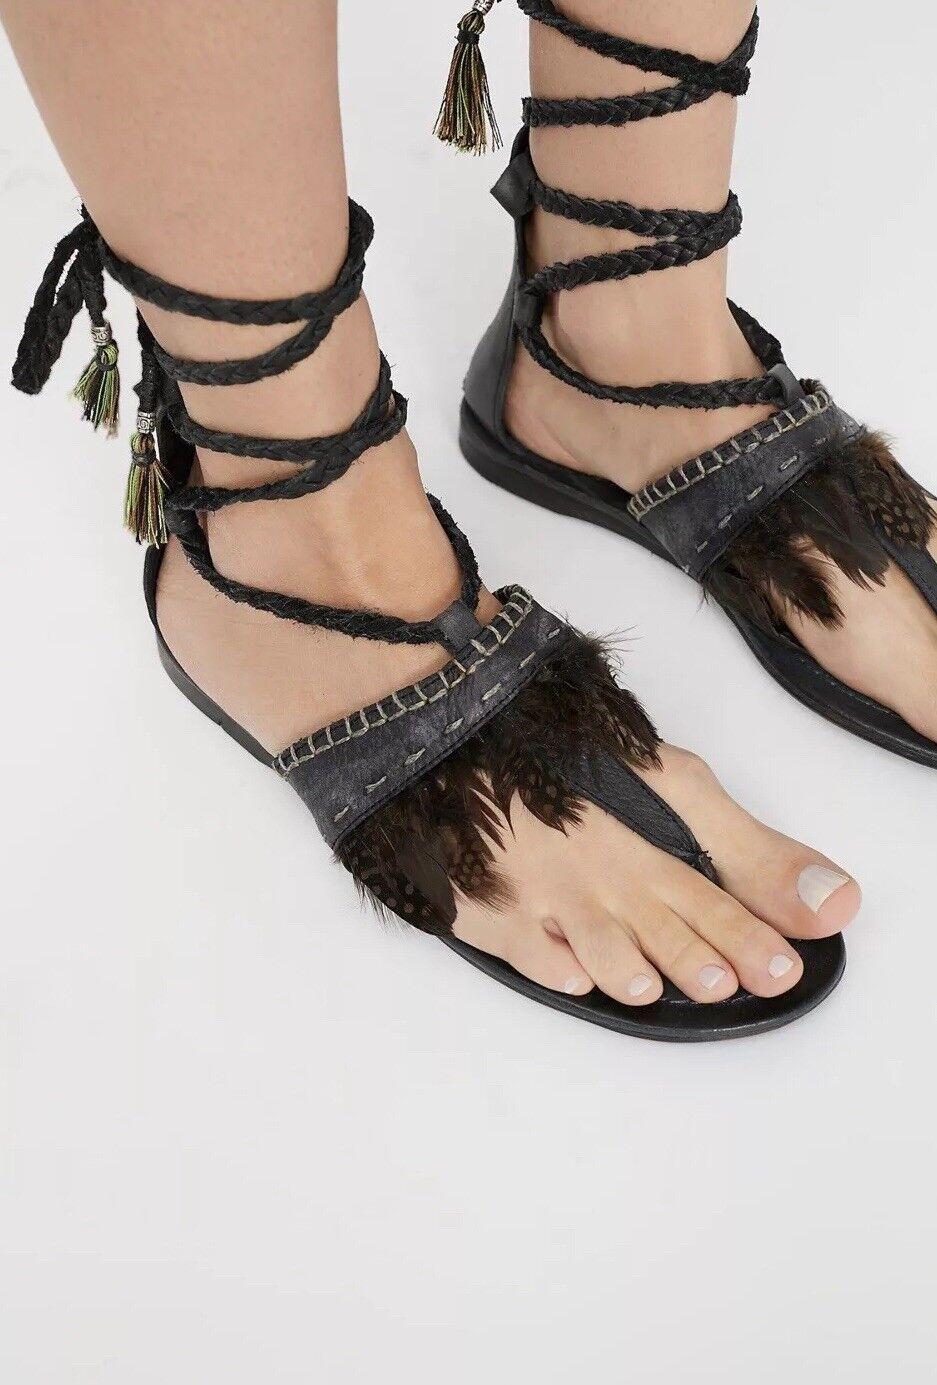 NEW Free People Bora Bora Wrap Sandals Dimensione Dimensione Dimensione 40 Kendy Feather b91126